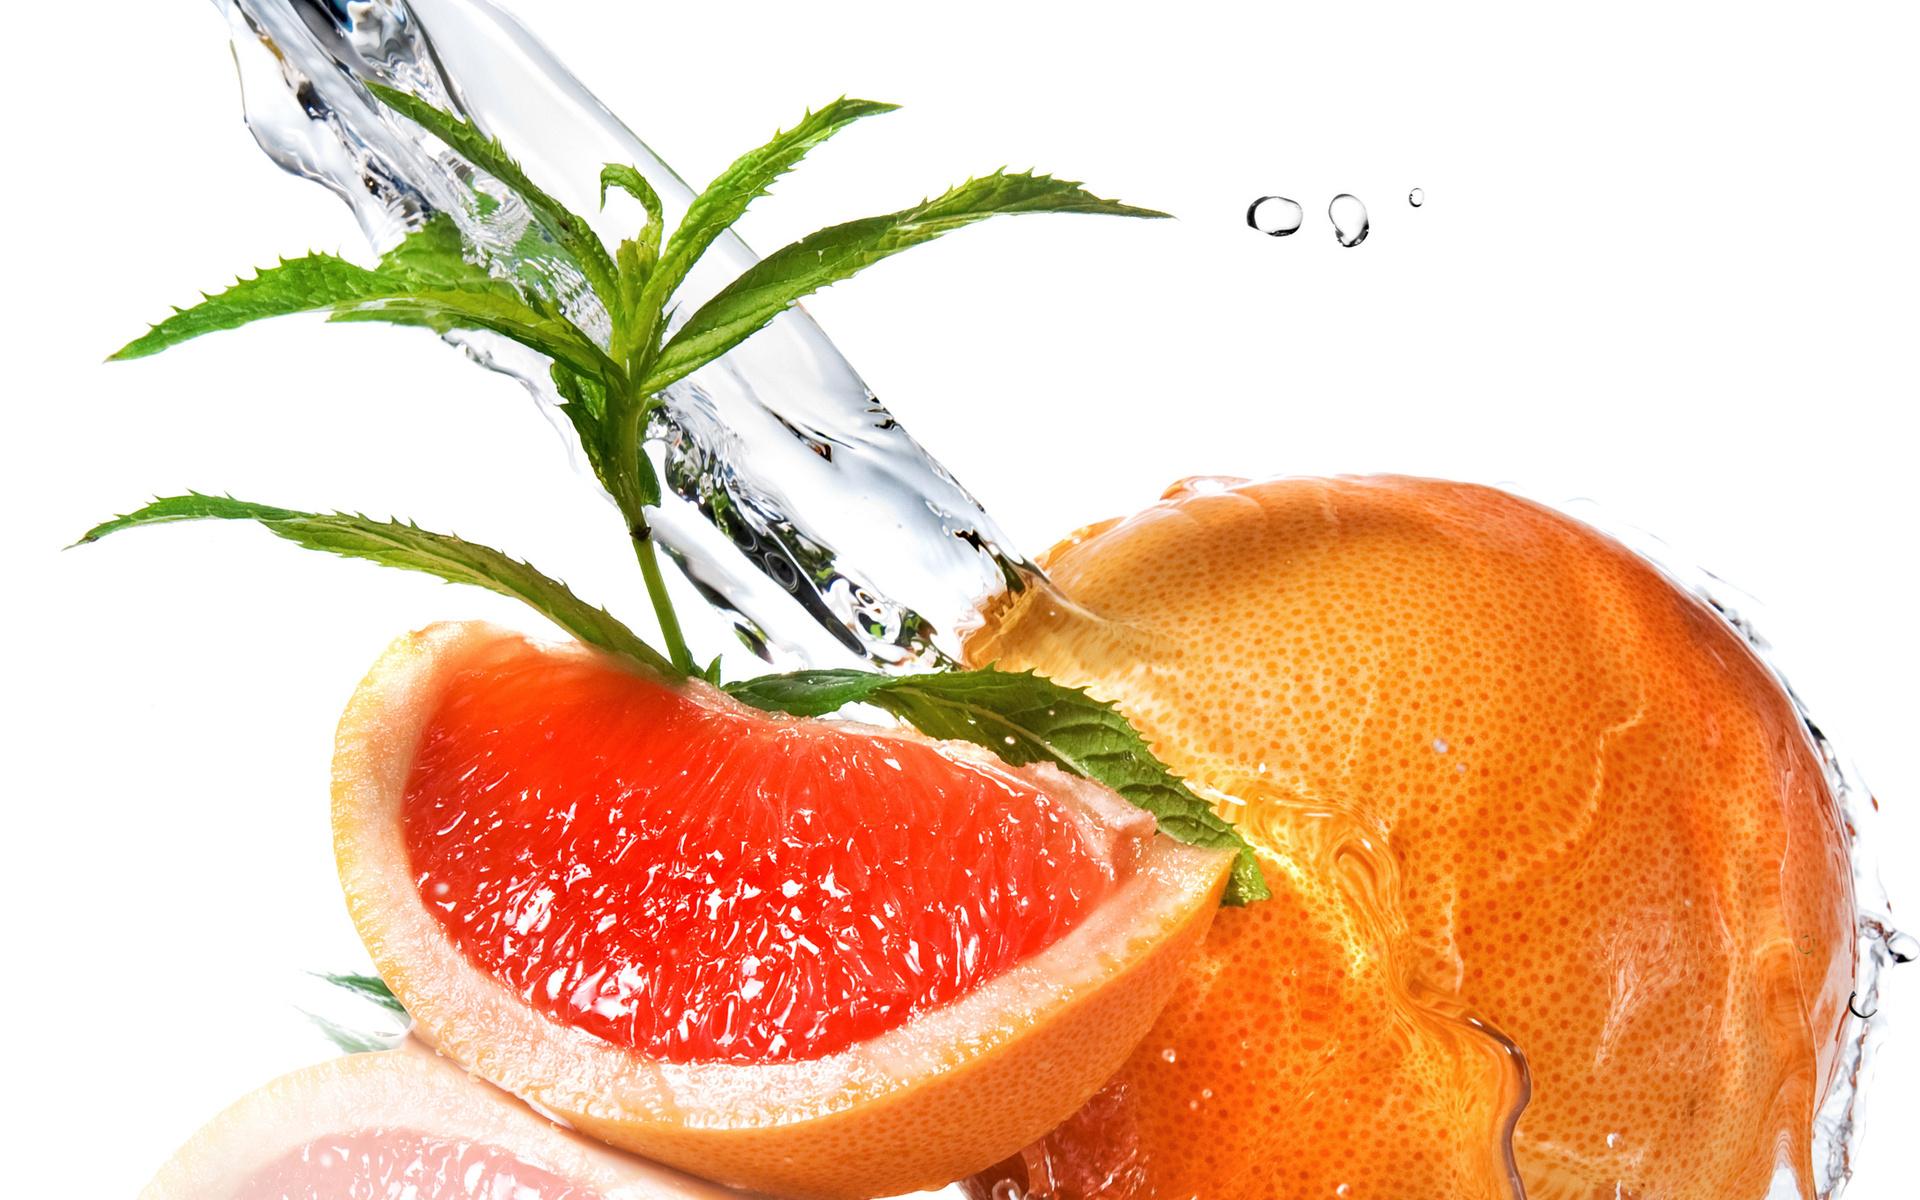 amazing grapefruit wallpaper 38884